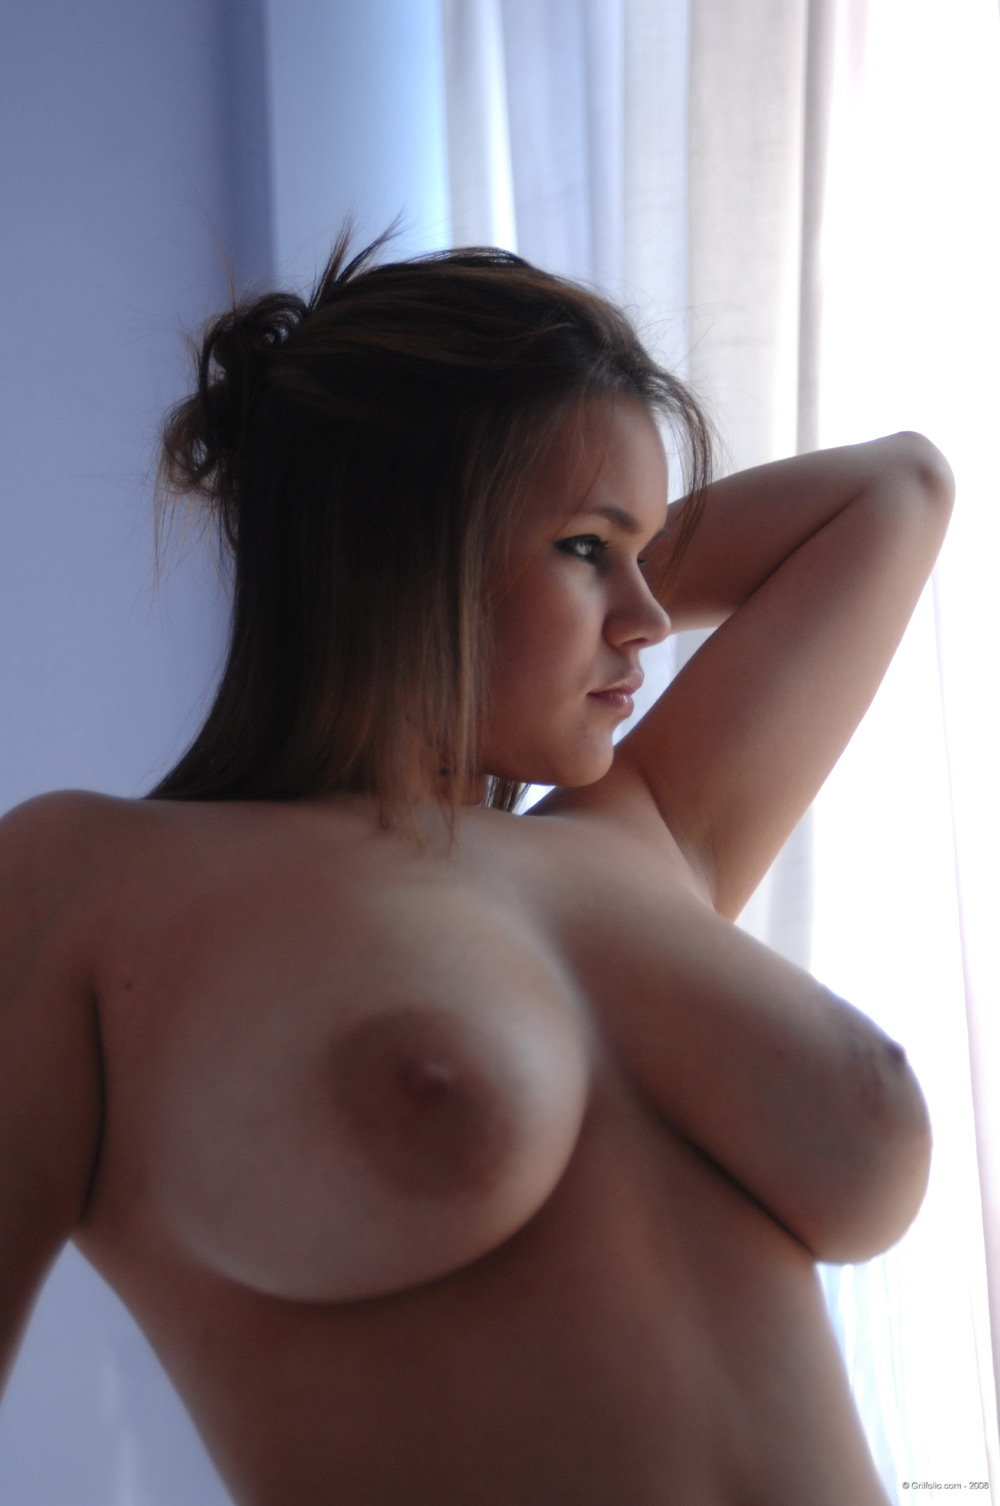 Nude girls emma nerdy nicholls